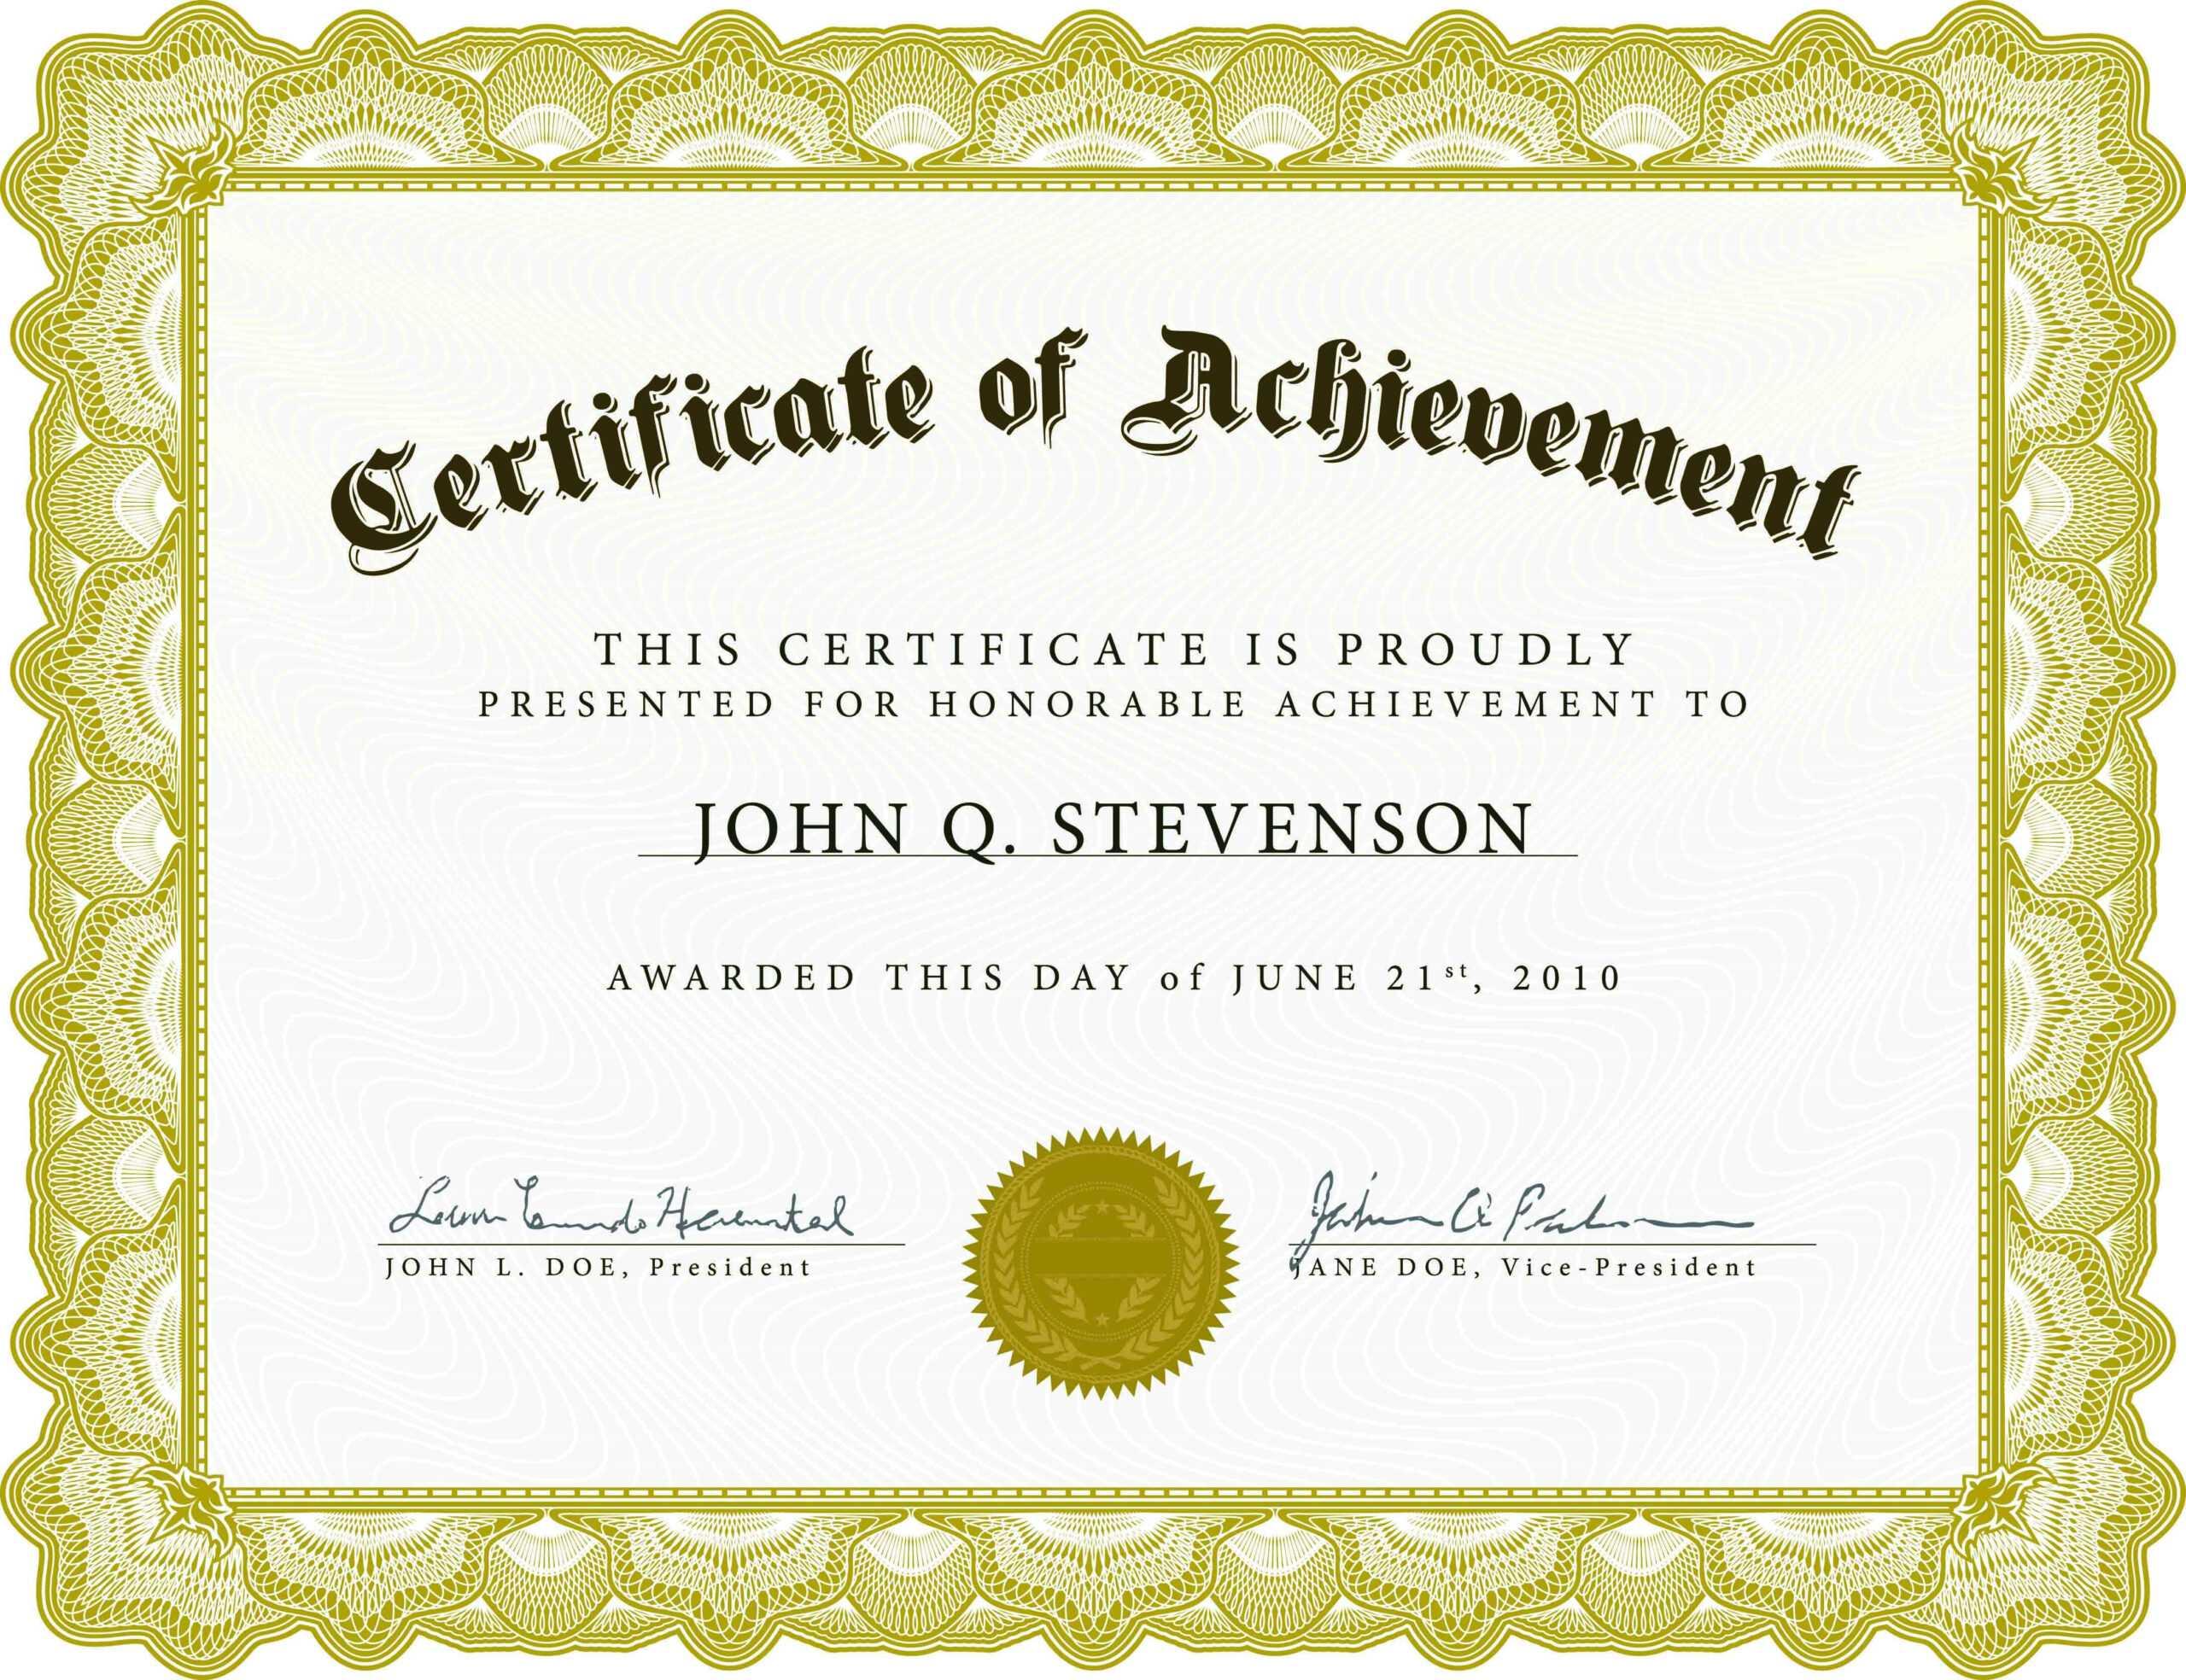 Farewell Certificate Template - Professional Template Inside Farewell Certificate Template